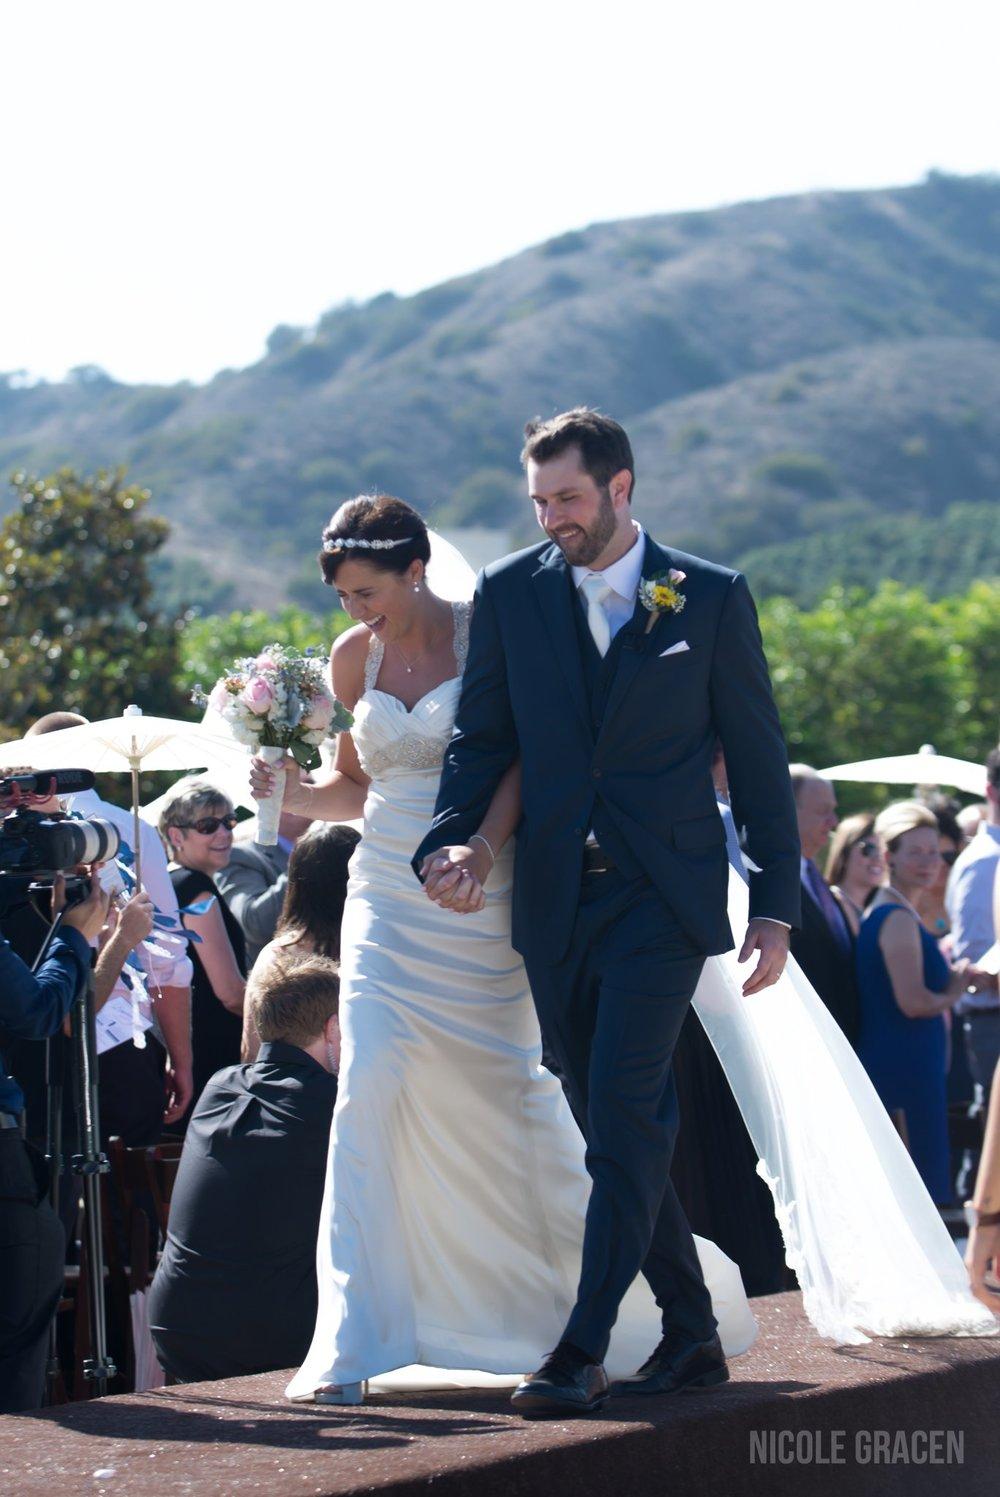 nicole-gracen-los-angeles-wedding-photographer-22.jpg